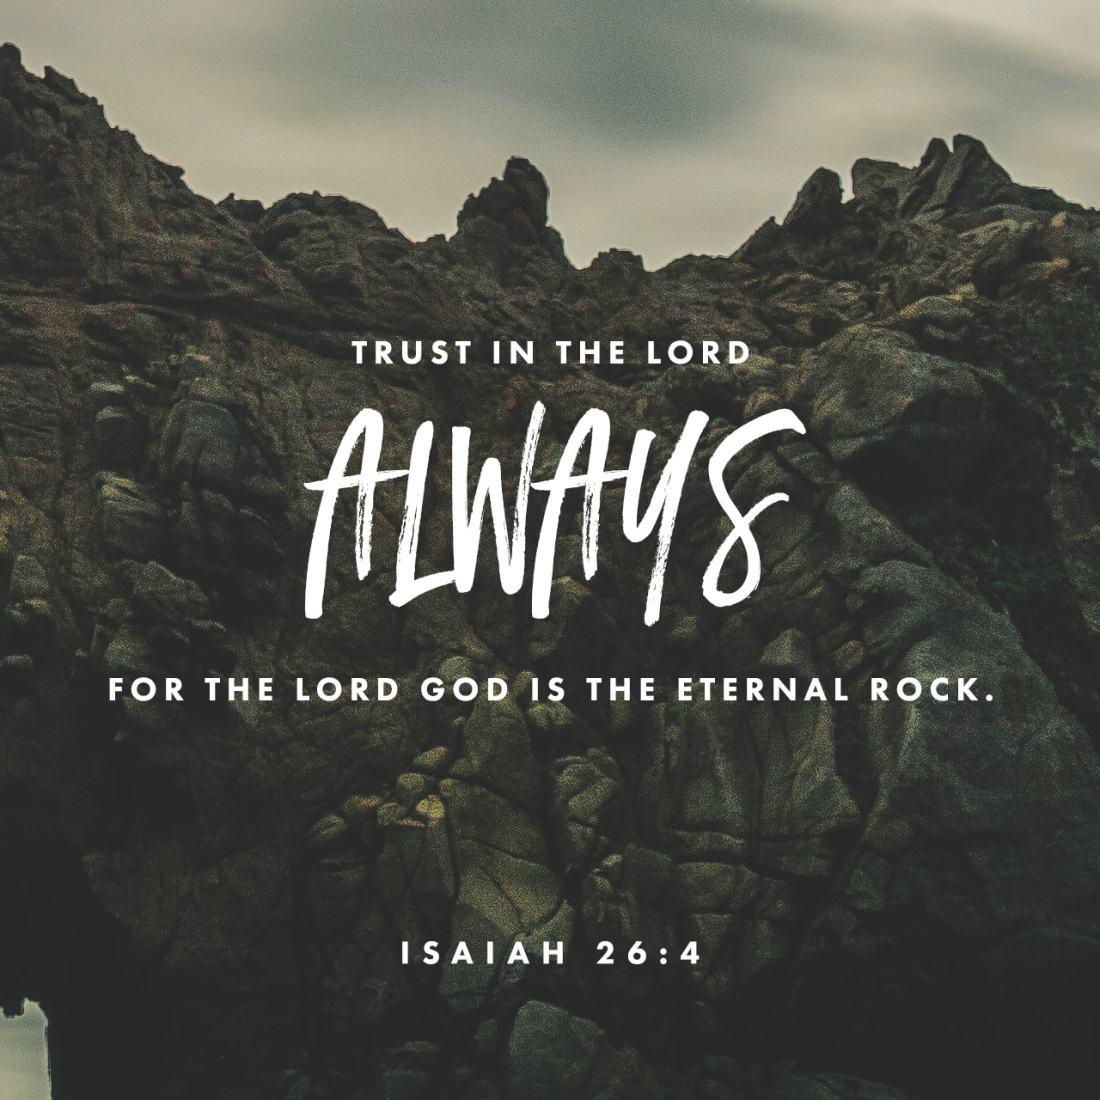 ScriptureArt_0317_-_Isaiah_26_4_NLT_English_157x157